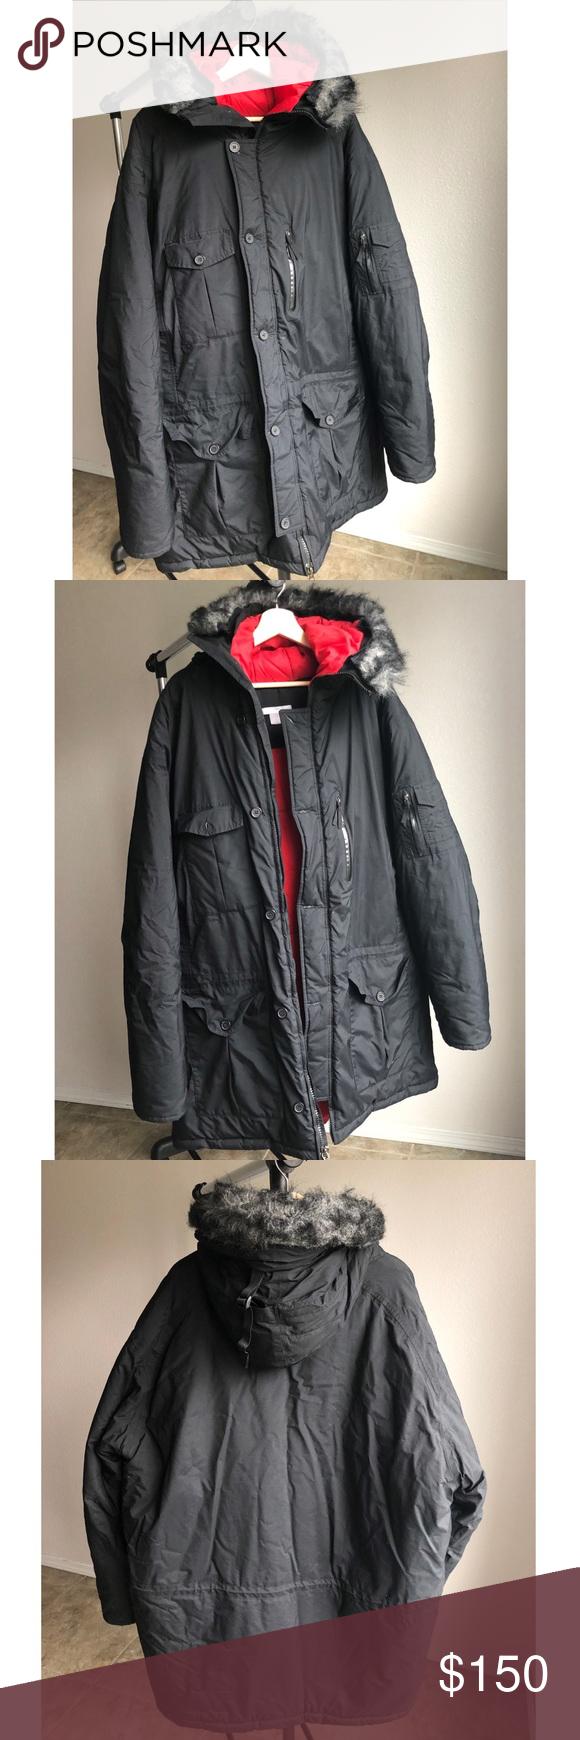 f9689c926415 NIKE Ski Snowboard Winter Puffer Coat Heavy XXL NIKE black and red heavy  winter jacket in